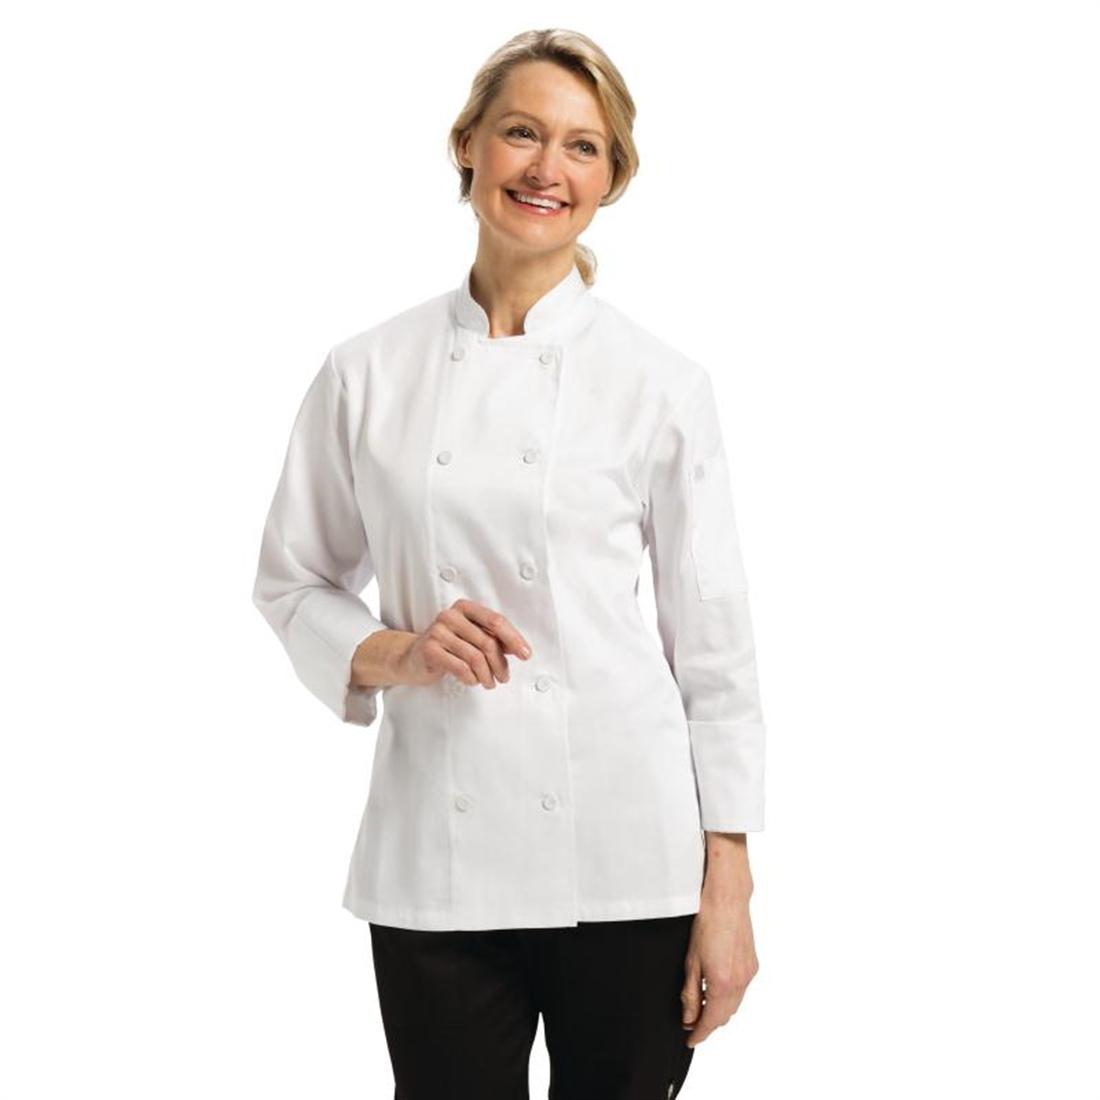 Chefs Jackets & Tunics